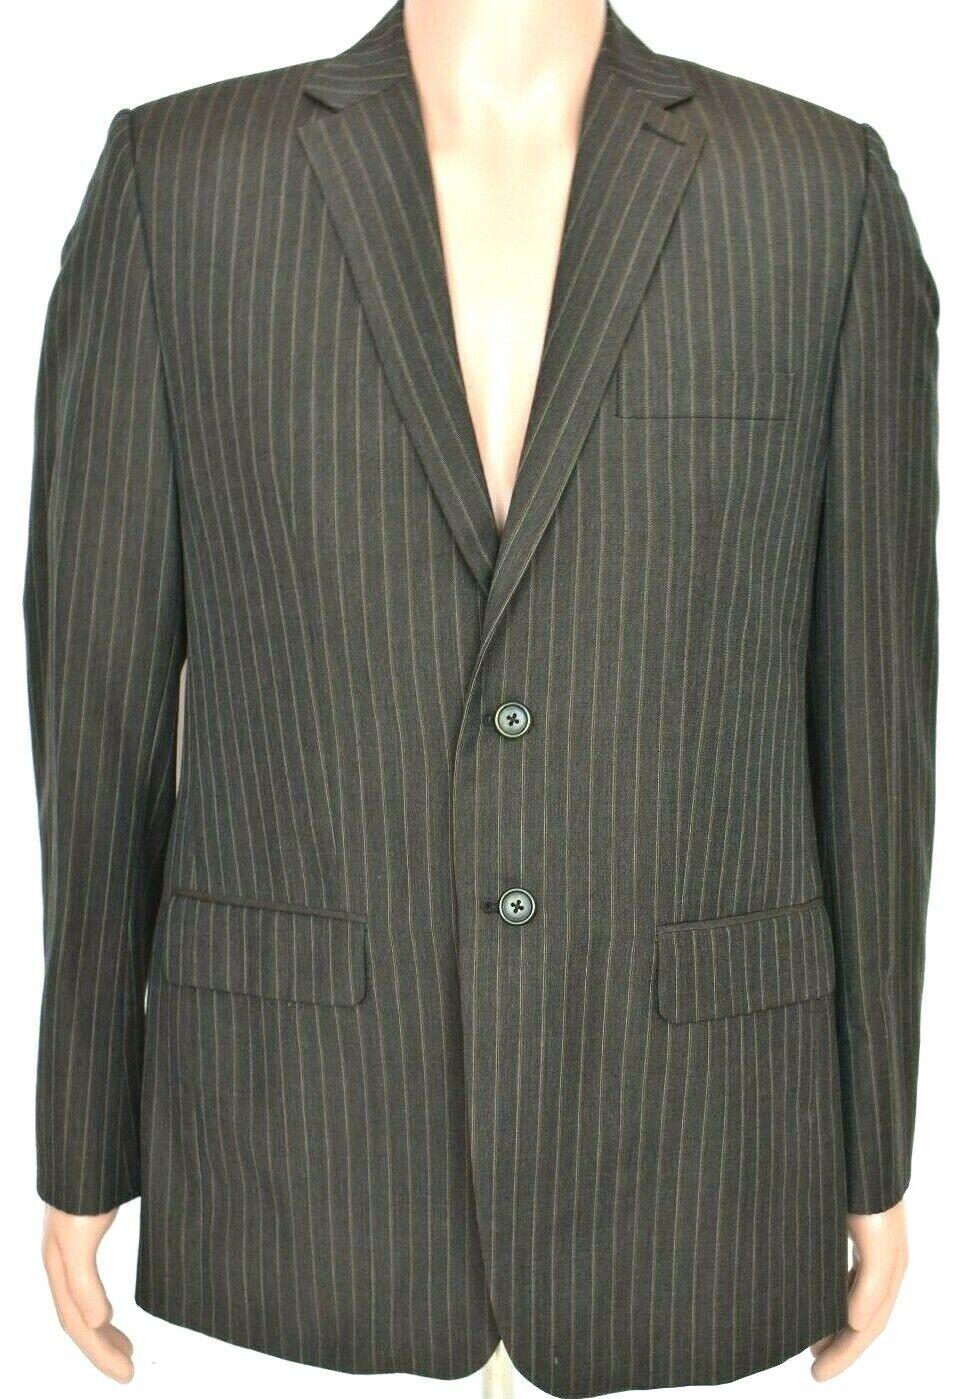 Luigi Ravelli Mens Brown Striped Blazer Size 38 R 100 % Pure New Wool Two Button